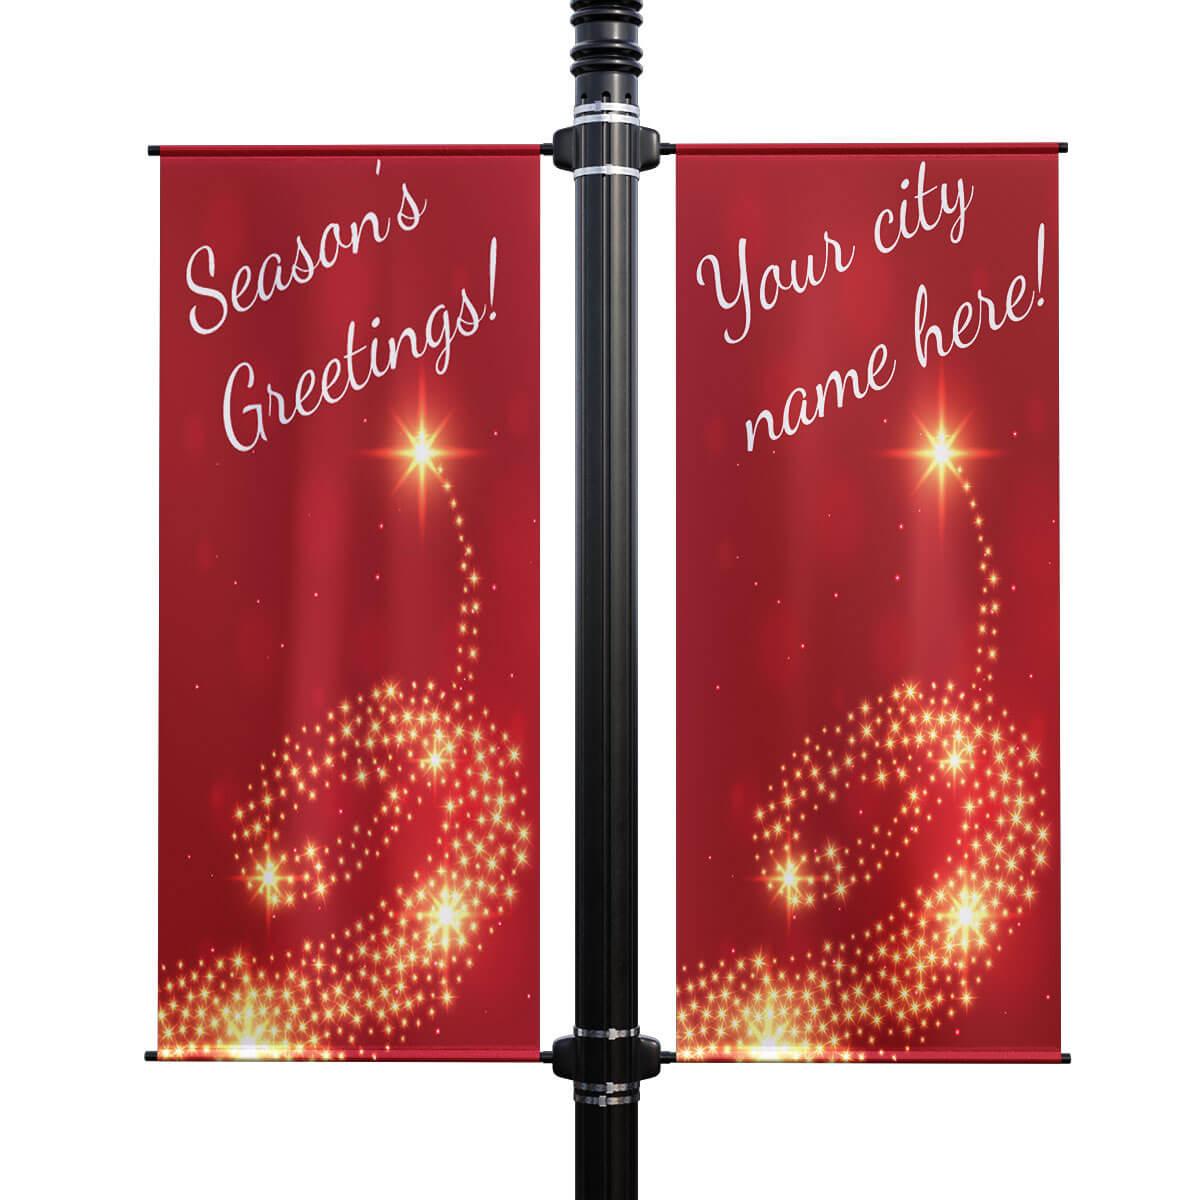 Seasons greetings double street pole banner kristyandbryce Choice Image